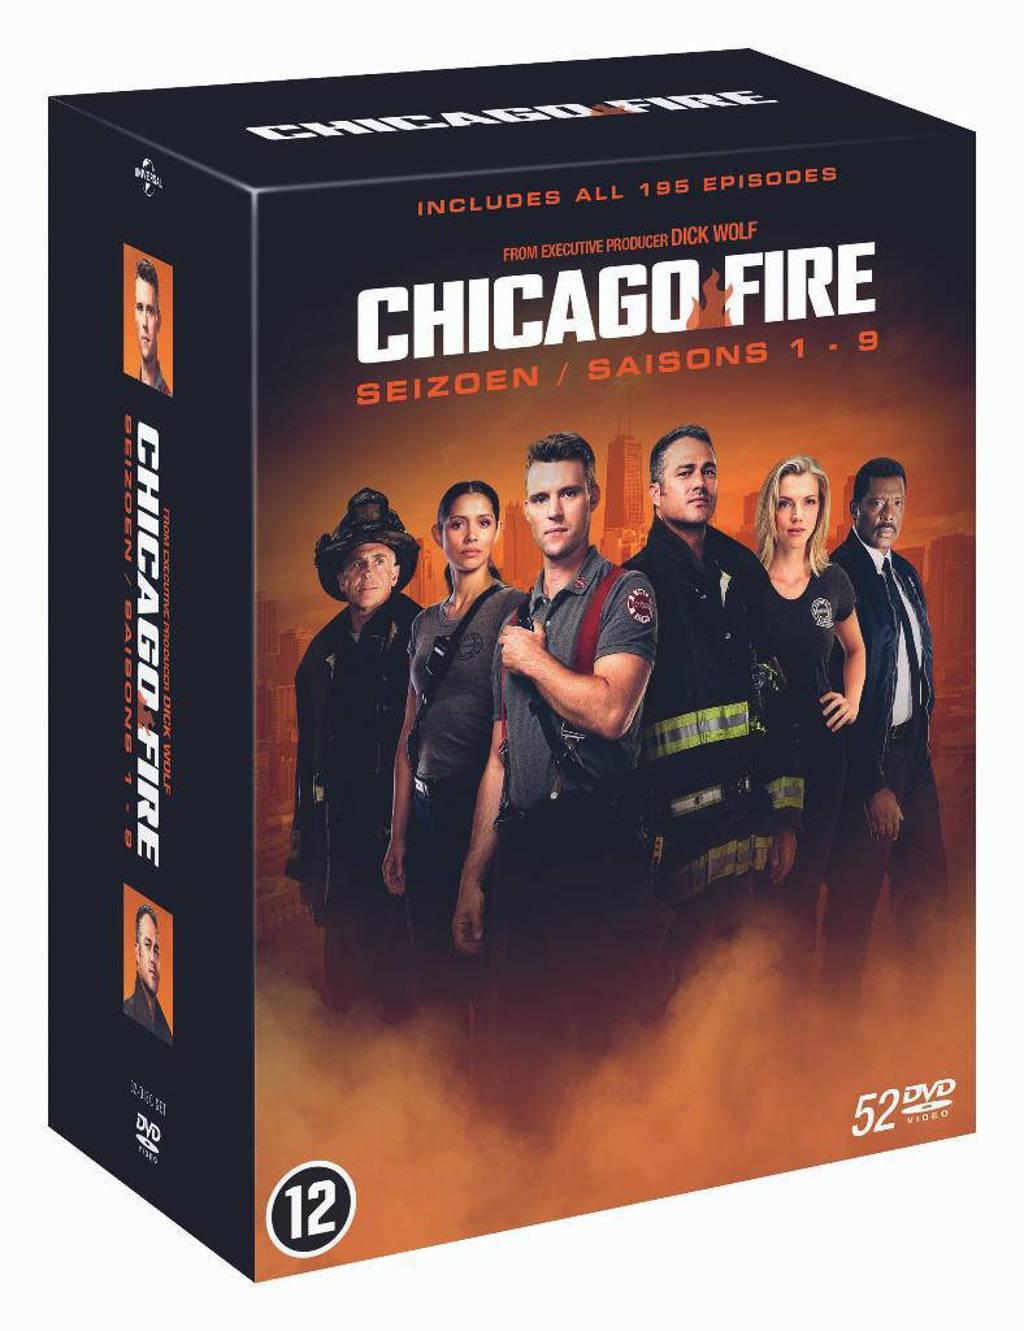 Chicago Fire - Seizoen 1 - 9 (DVD)